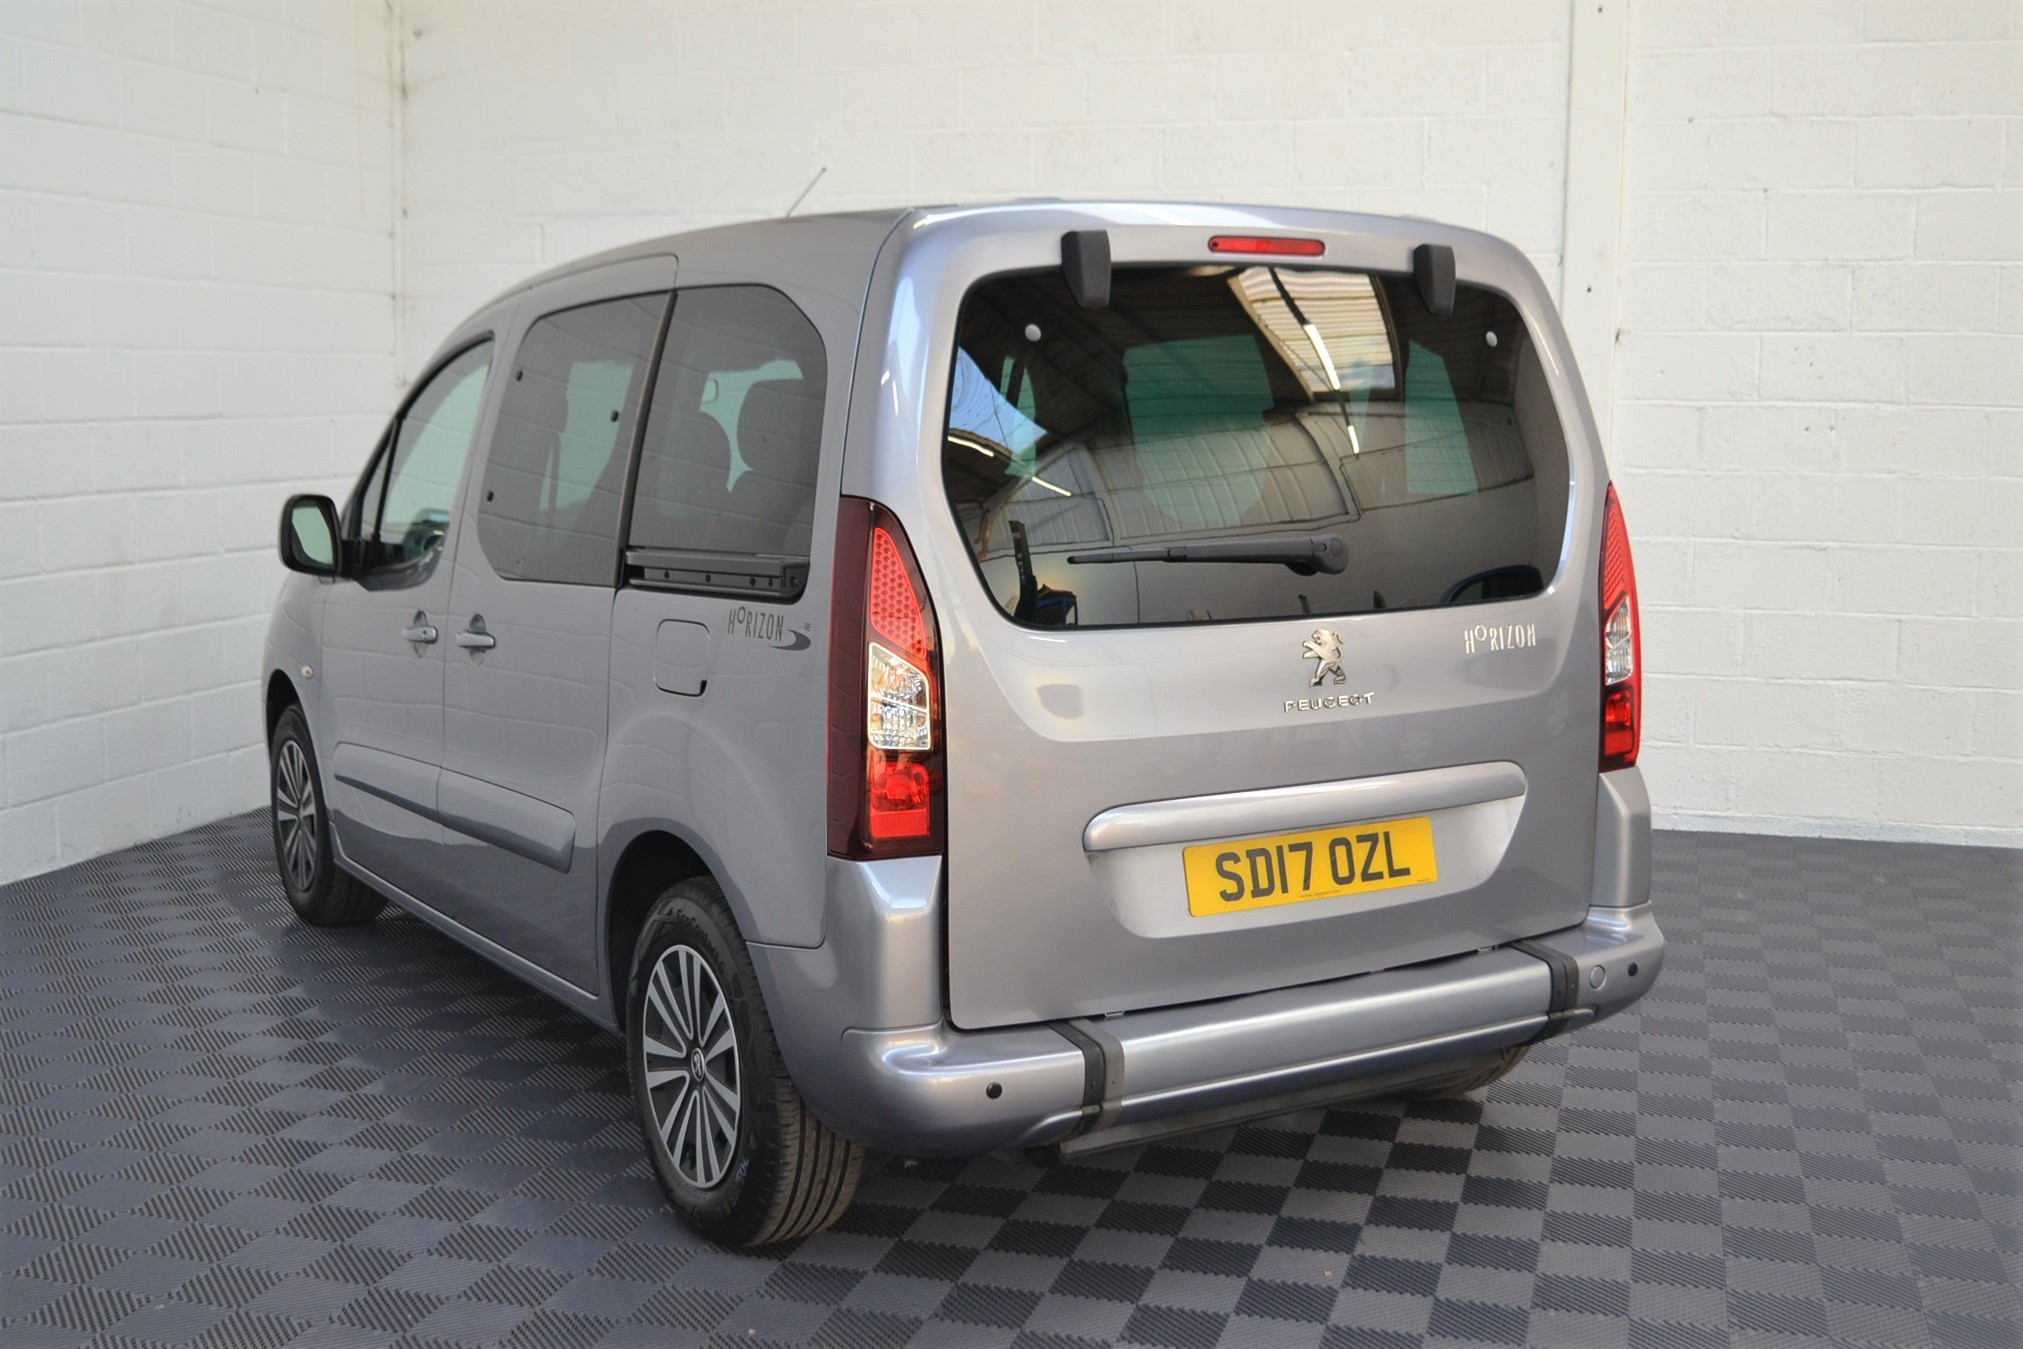 WAV Cars For Sale Bristol Wheelchair Accessible Vehicles Used For Sale Somerset Devon Dorset Bath Peugeot Partner SD17 OZL 3